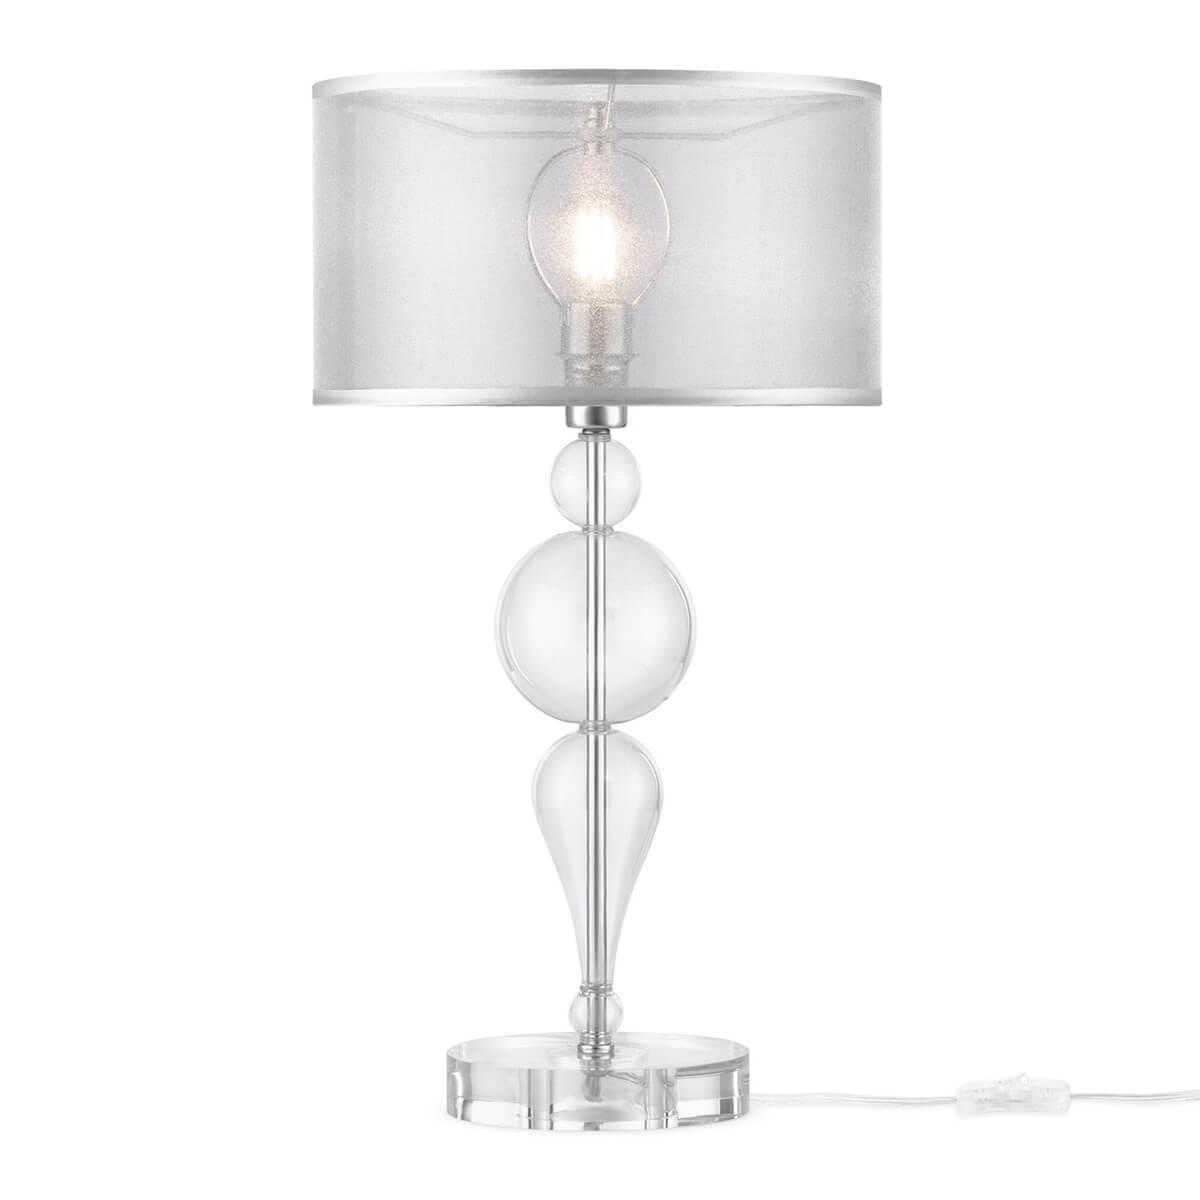 Настольная лампа Maytoni MOD603-11-N Bubble Dreams фото